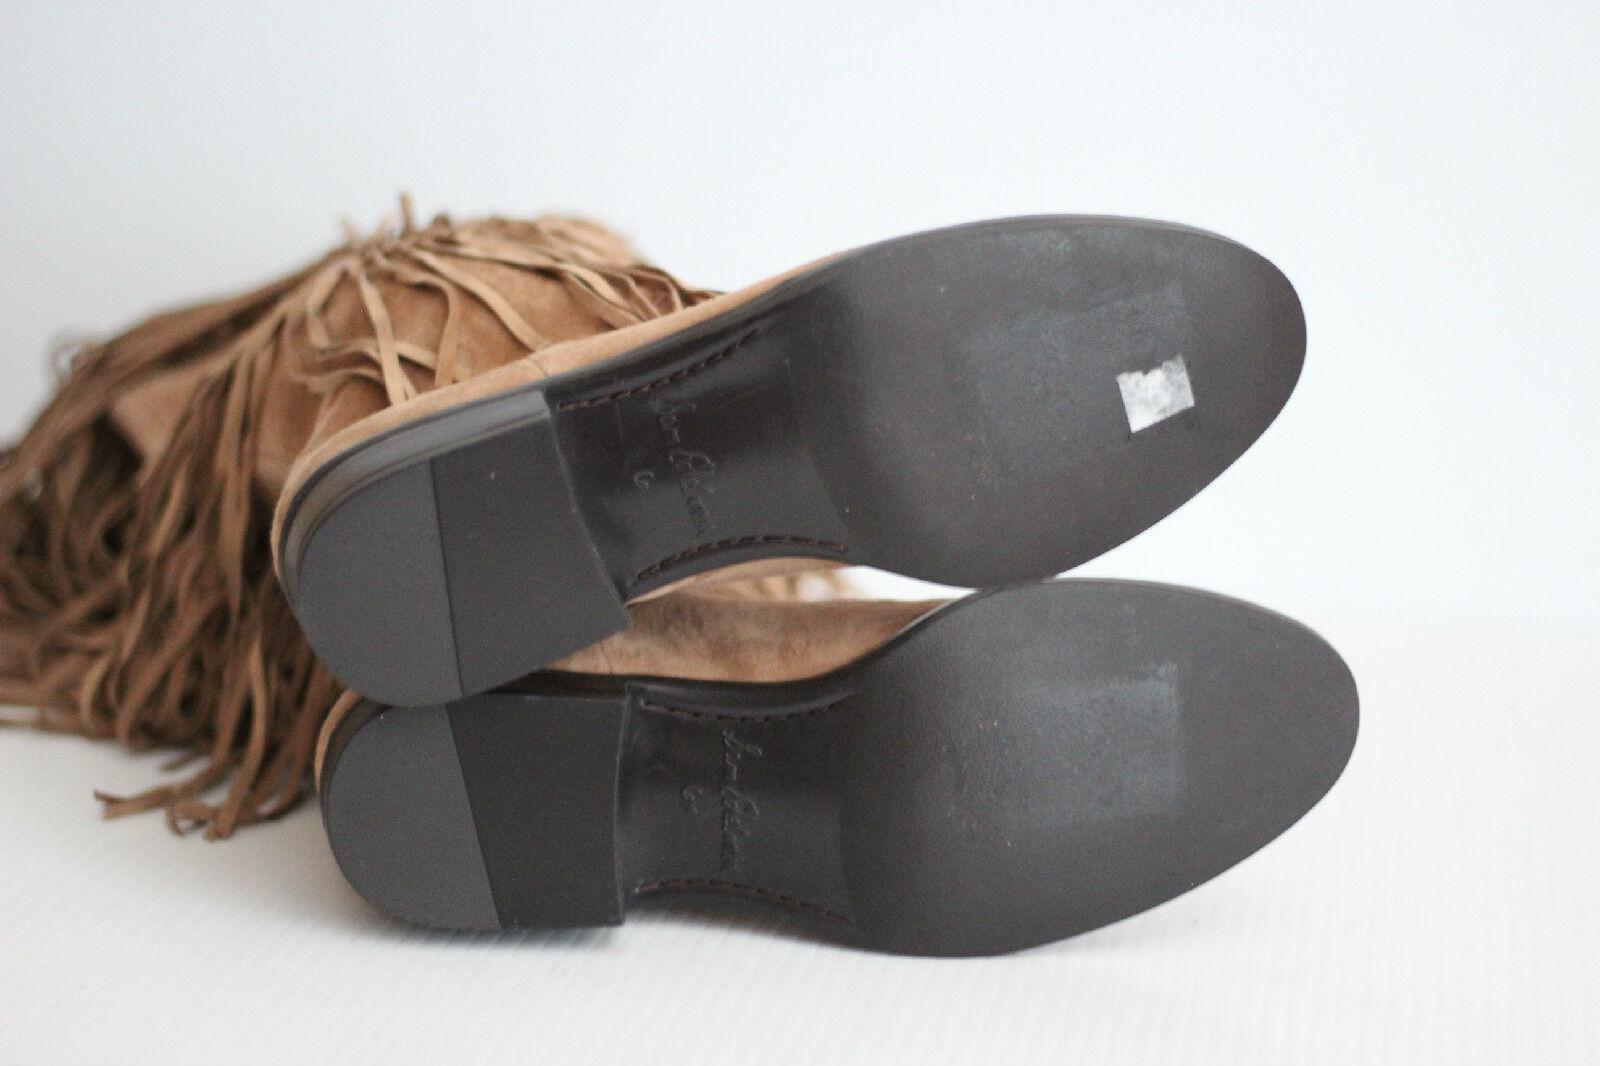 NEW Sam Edelman 'Pendra' Fringe Oatmeal Suede Western Boot - Oatmeal Fringe Tan Braun - 6M (X4) bead0a